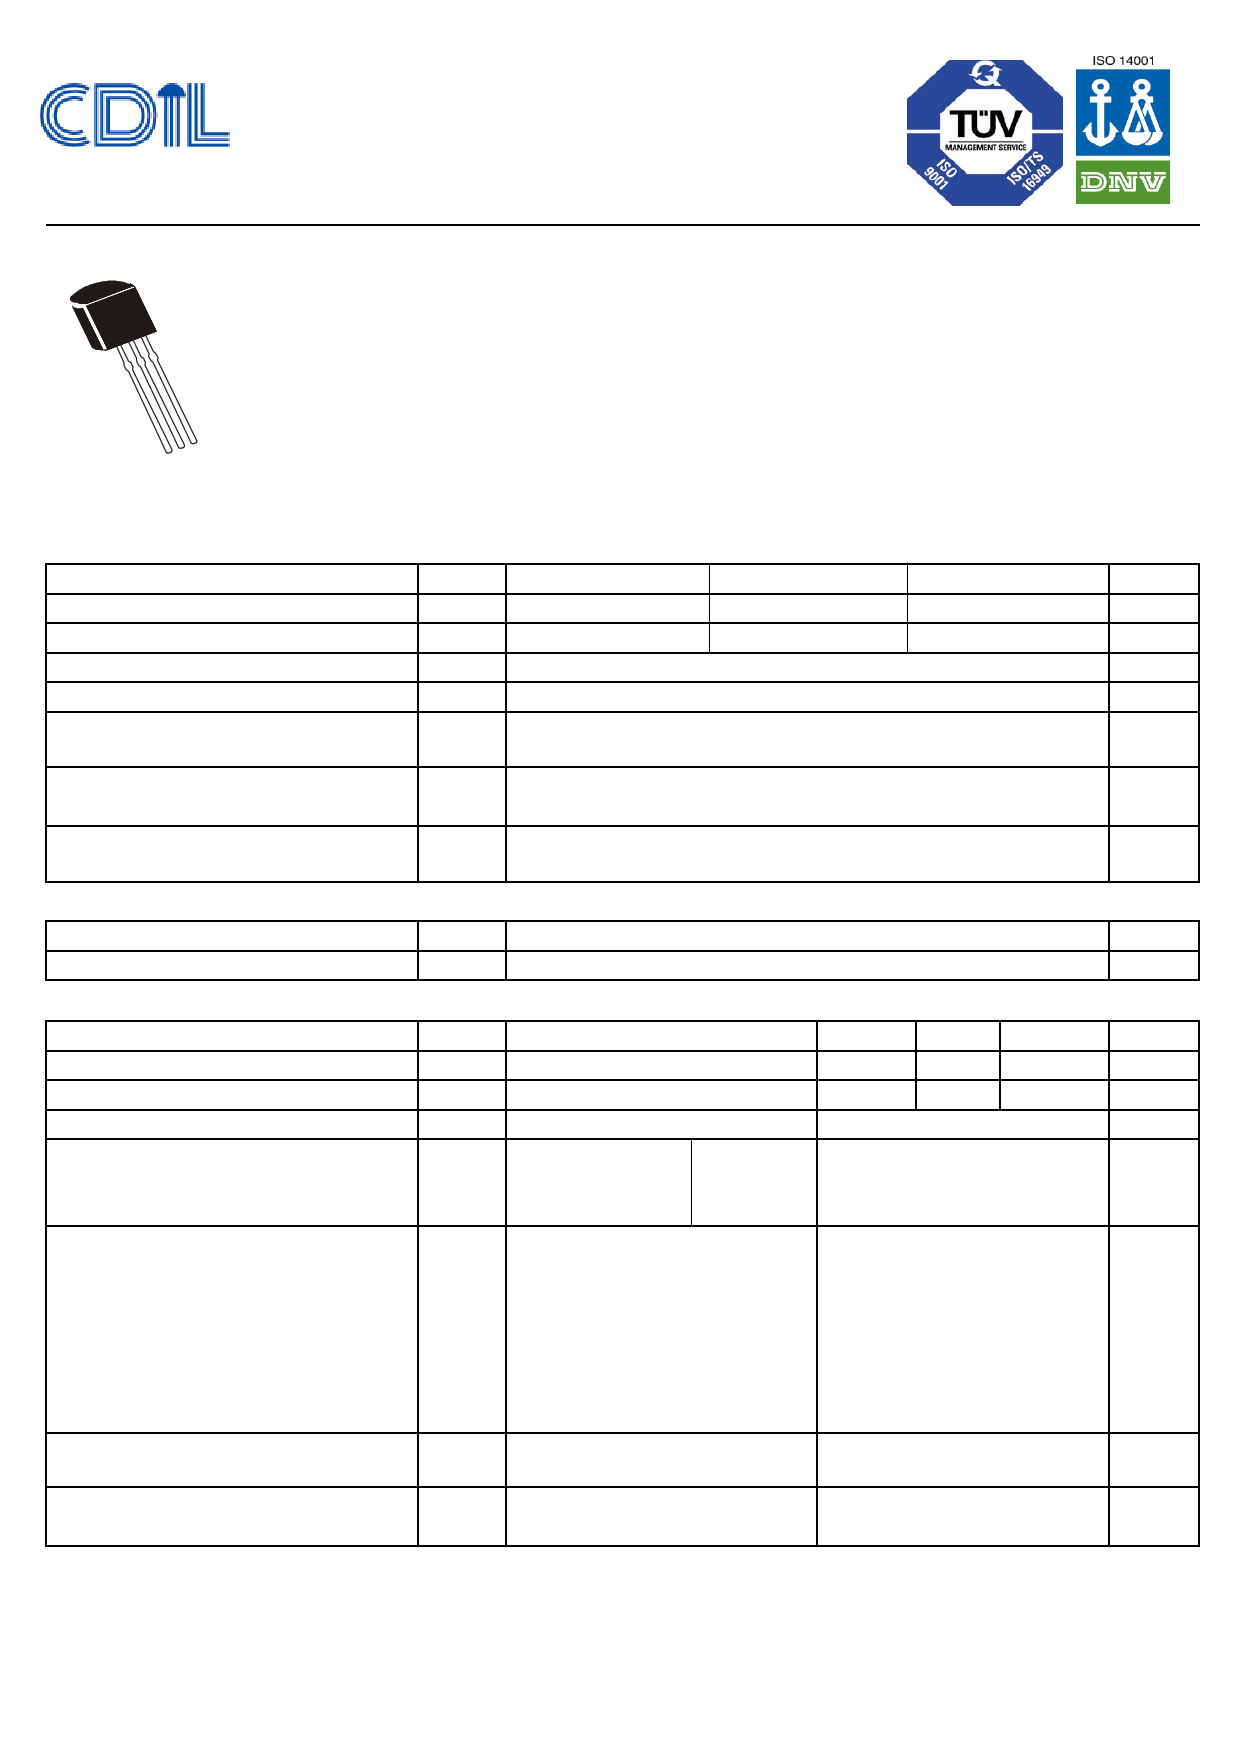 BC489L 데이터시트 및 BC489L PDF